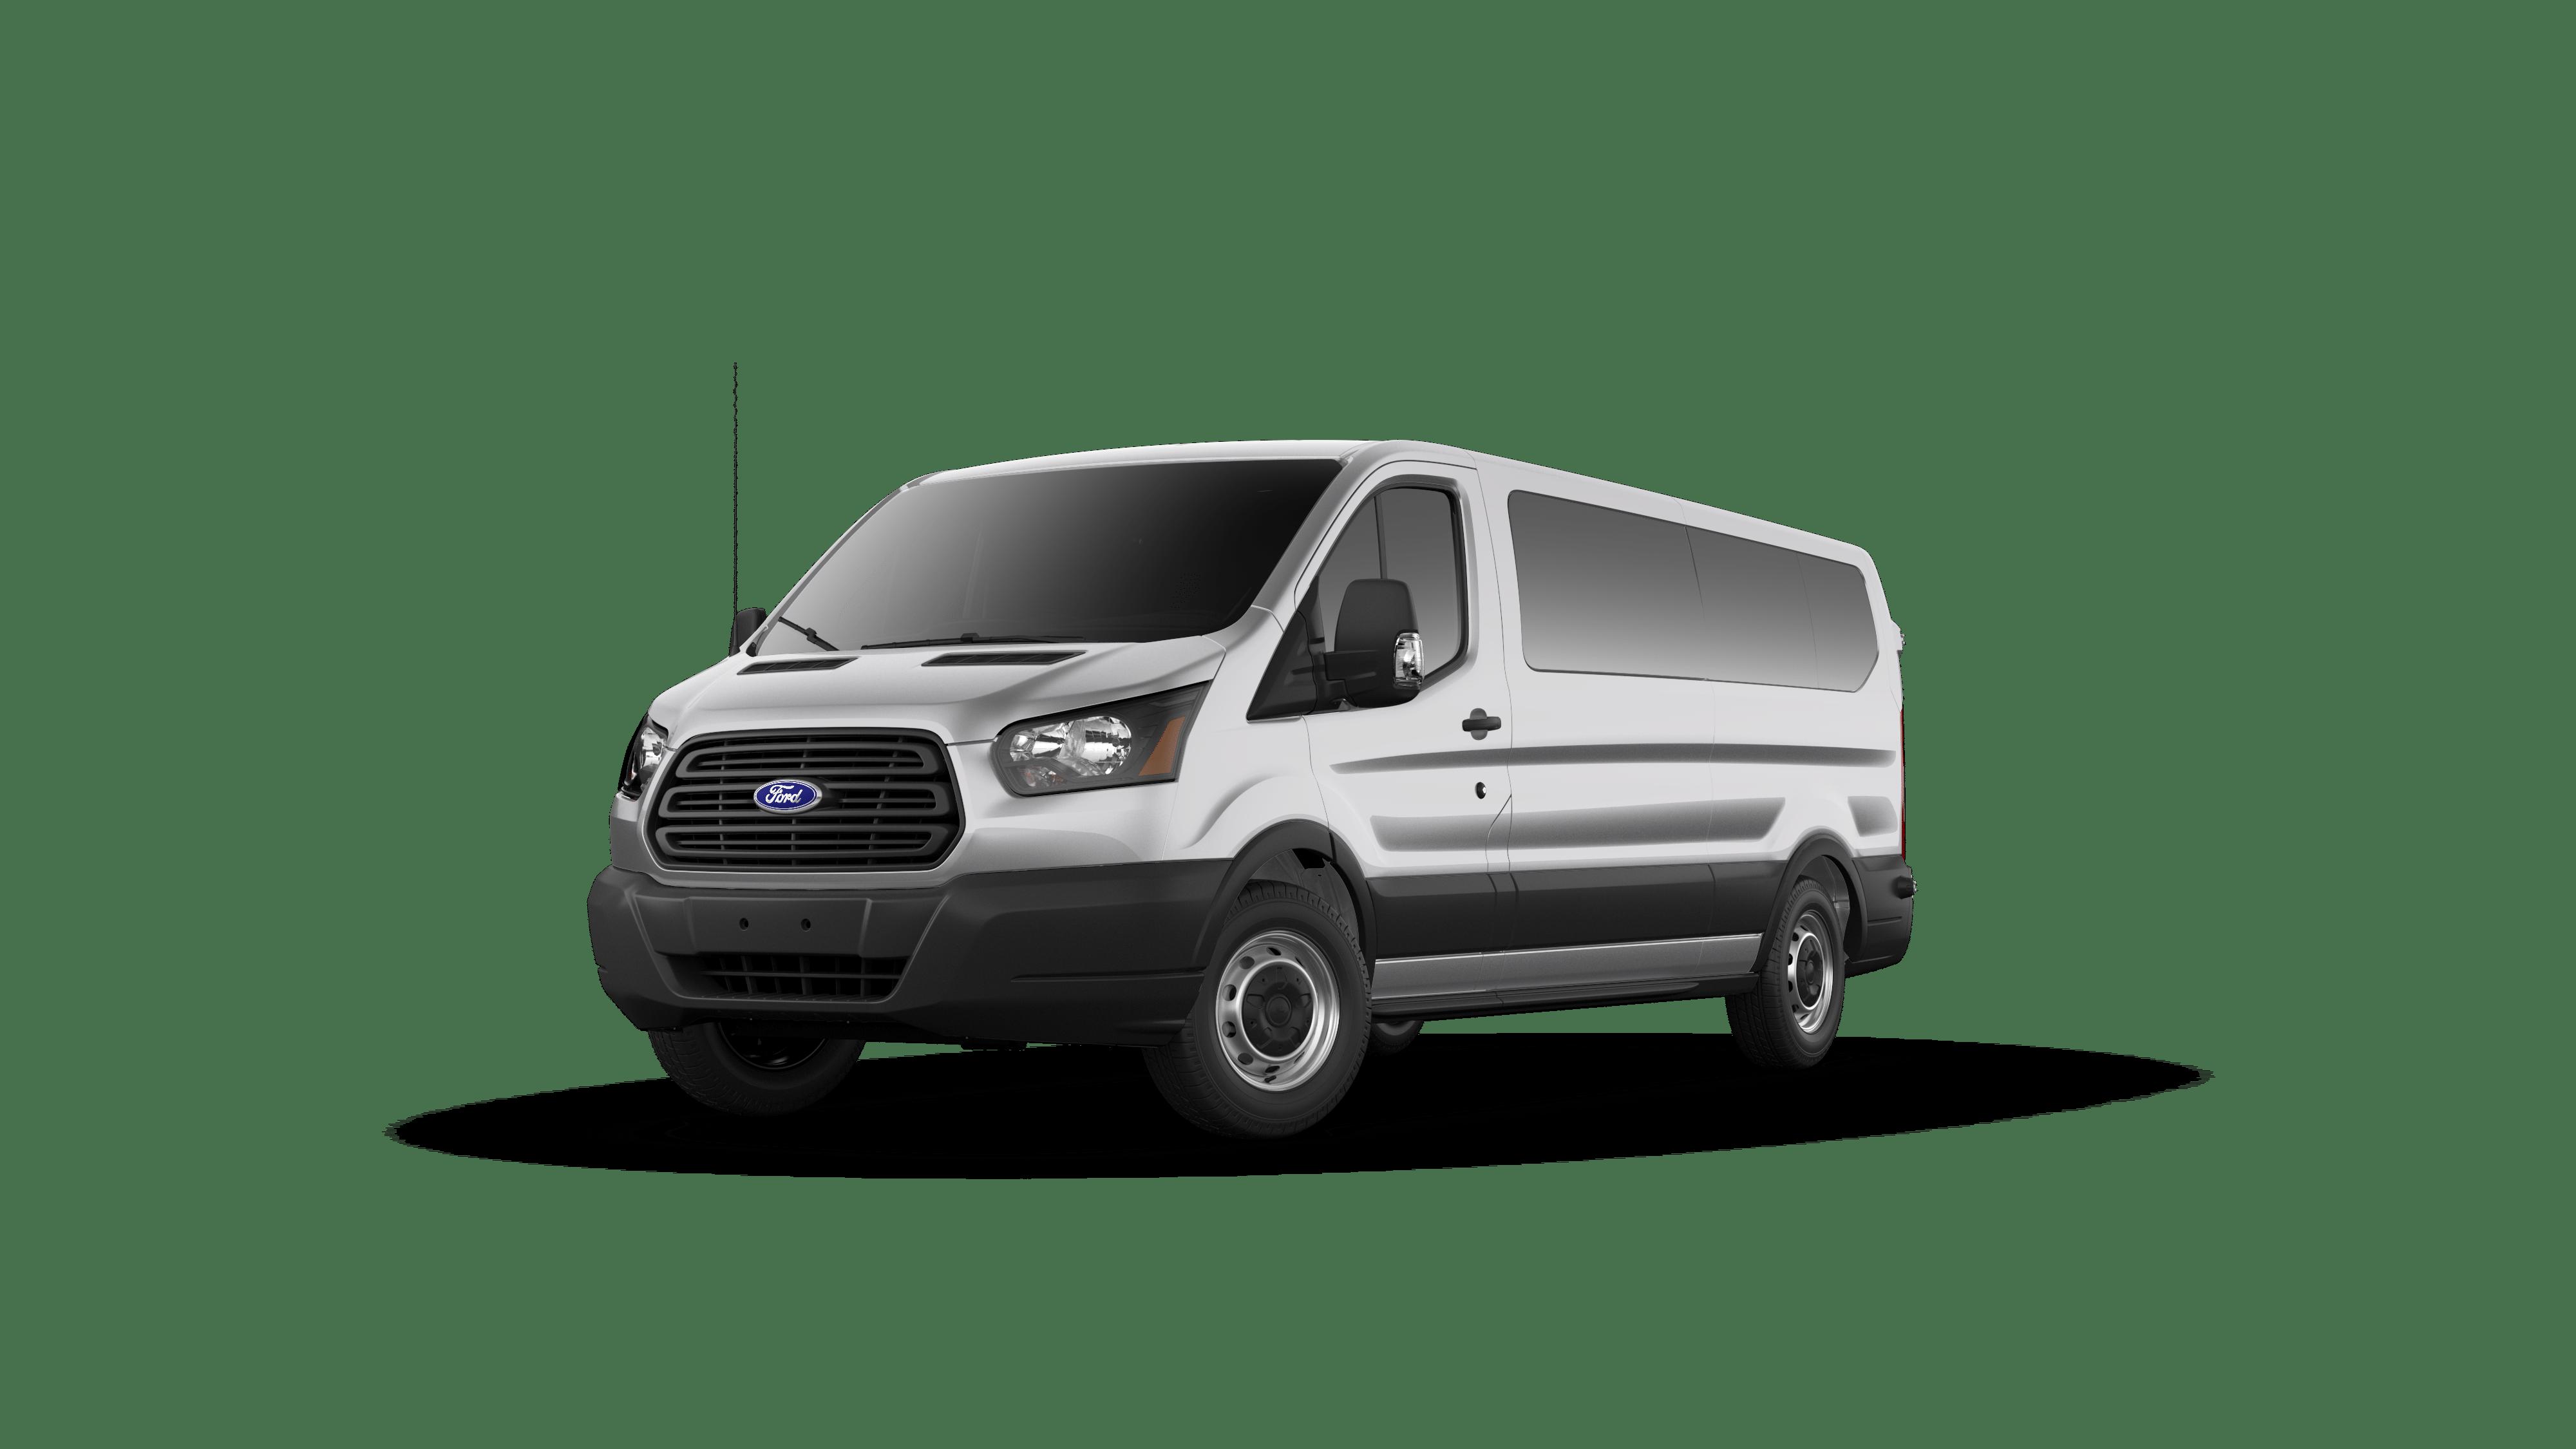 2019 Ford Transit Passenger Wagon Vehicle Photo in Quakertown, PA 18951-1403